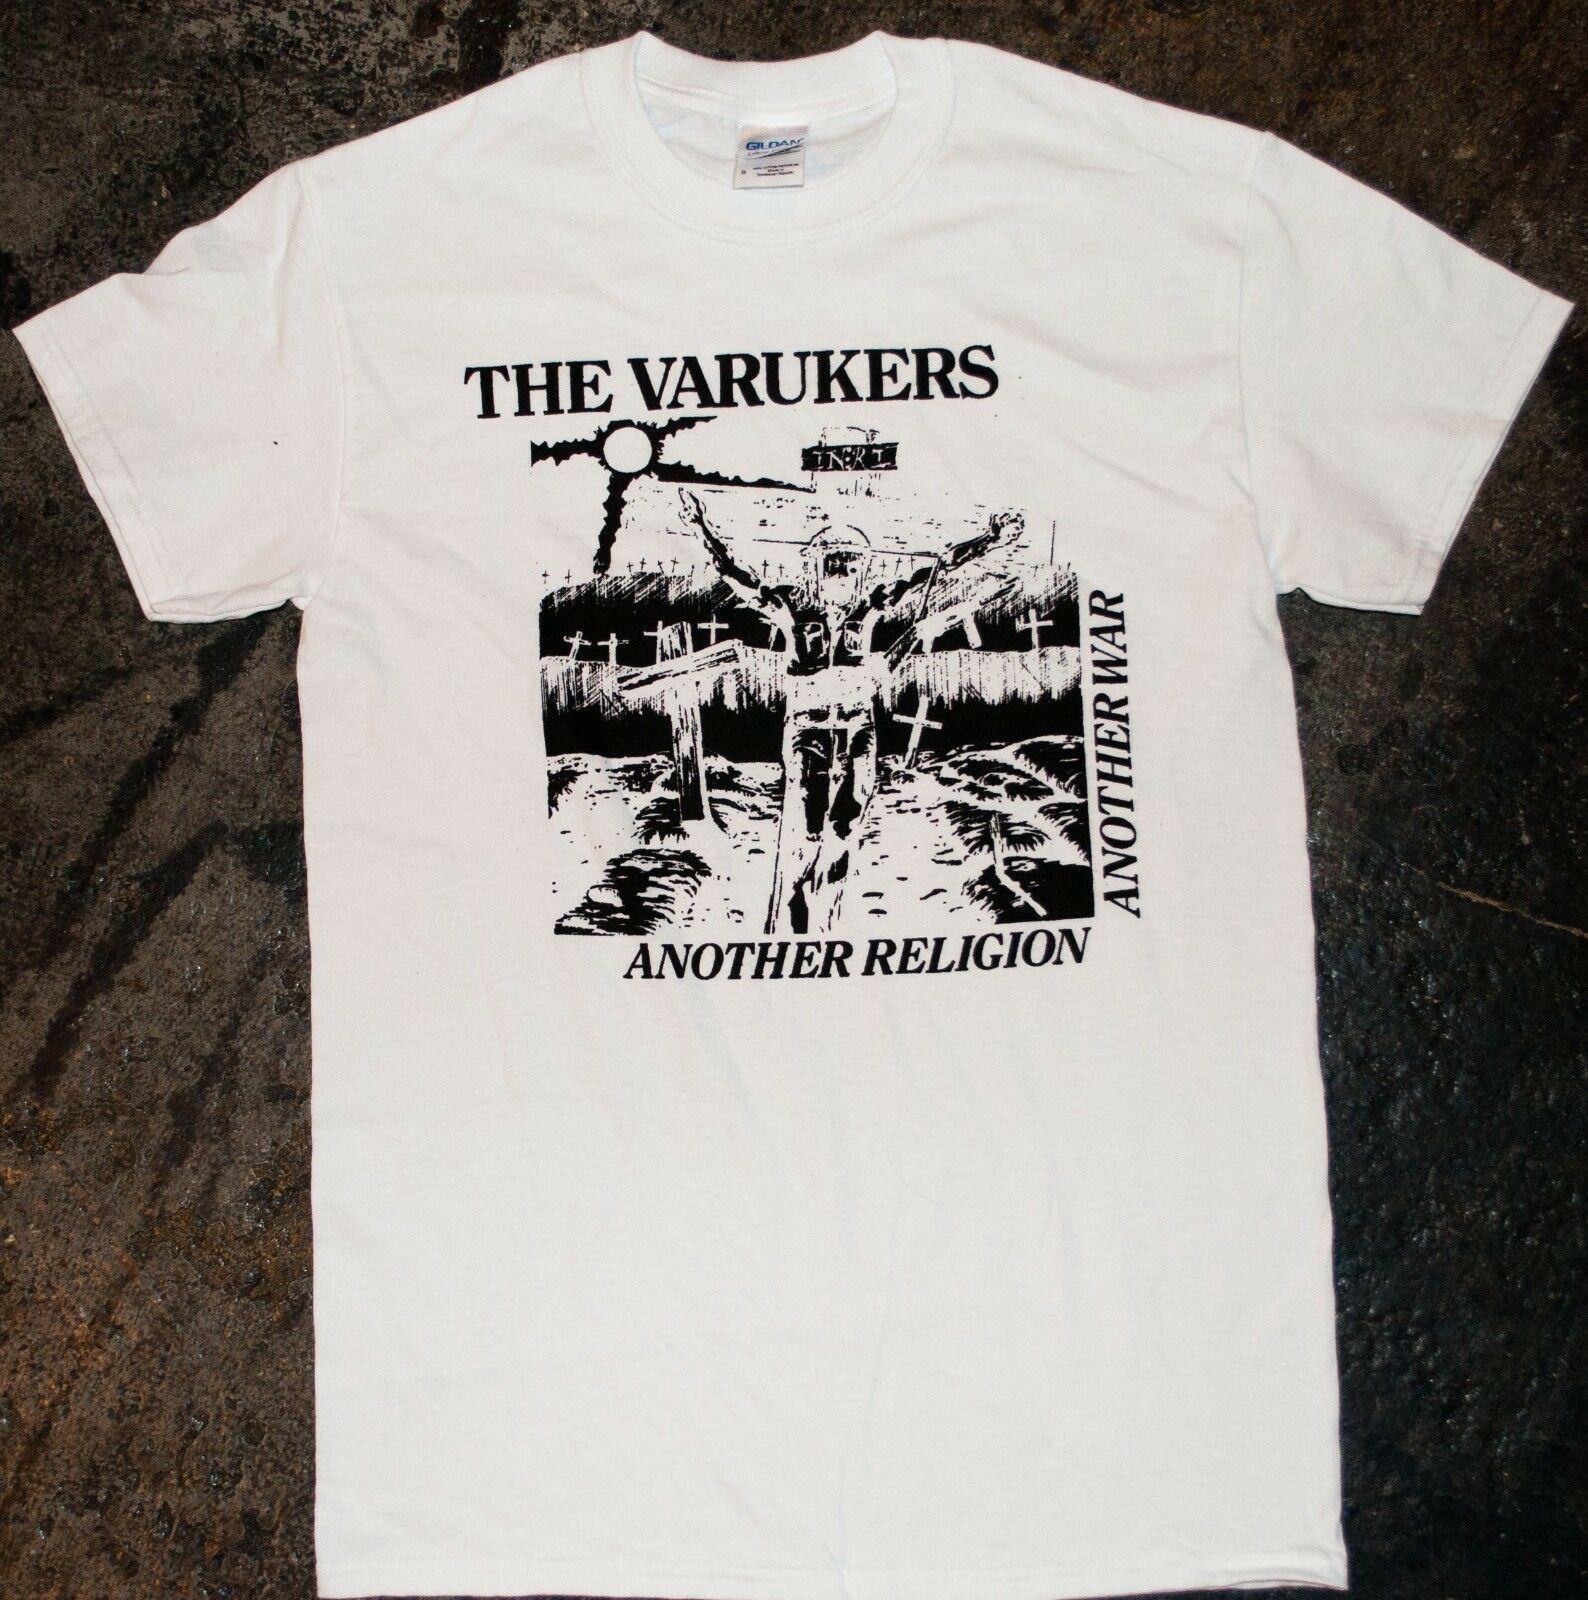 Las Varukers otra religión camiseta Punk Oi Kbd descarga sacrilegio